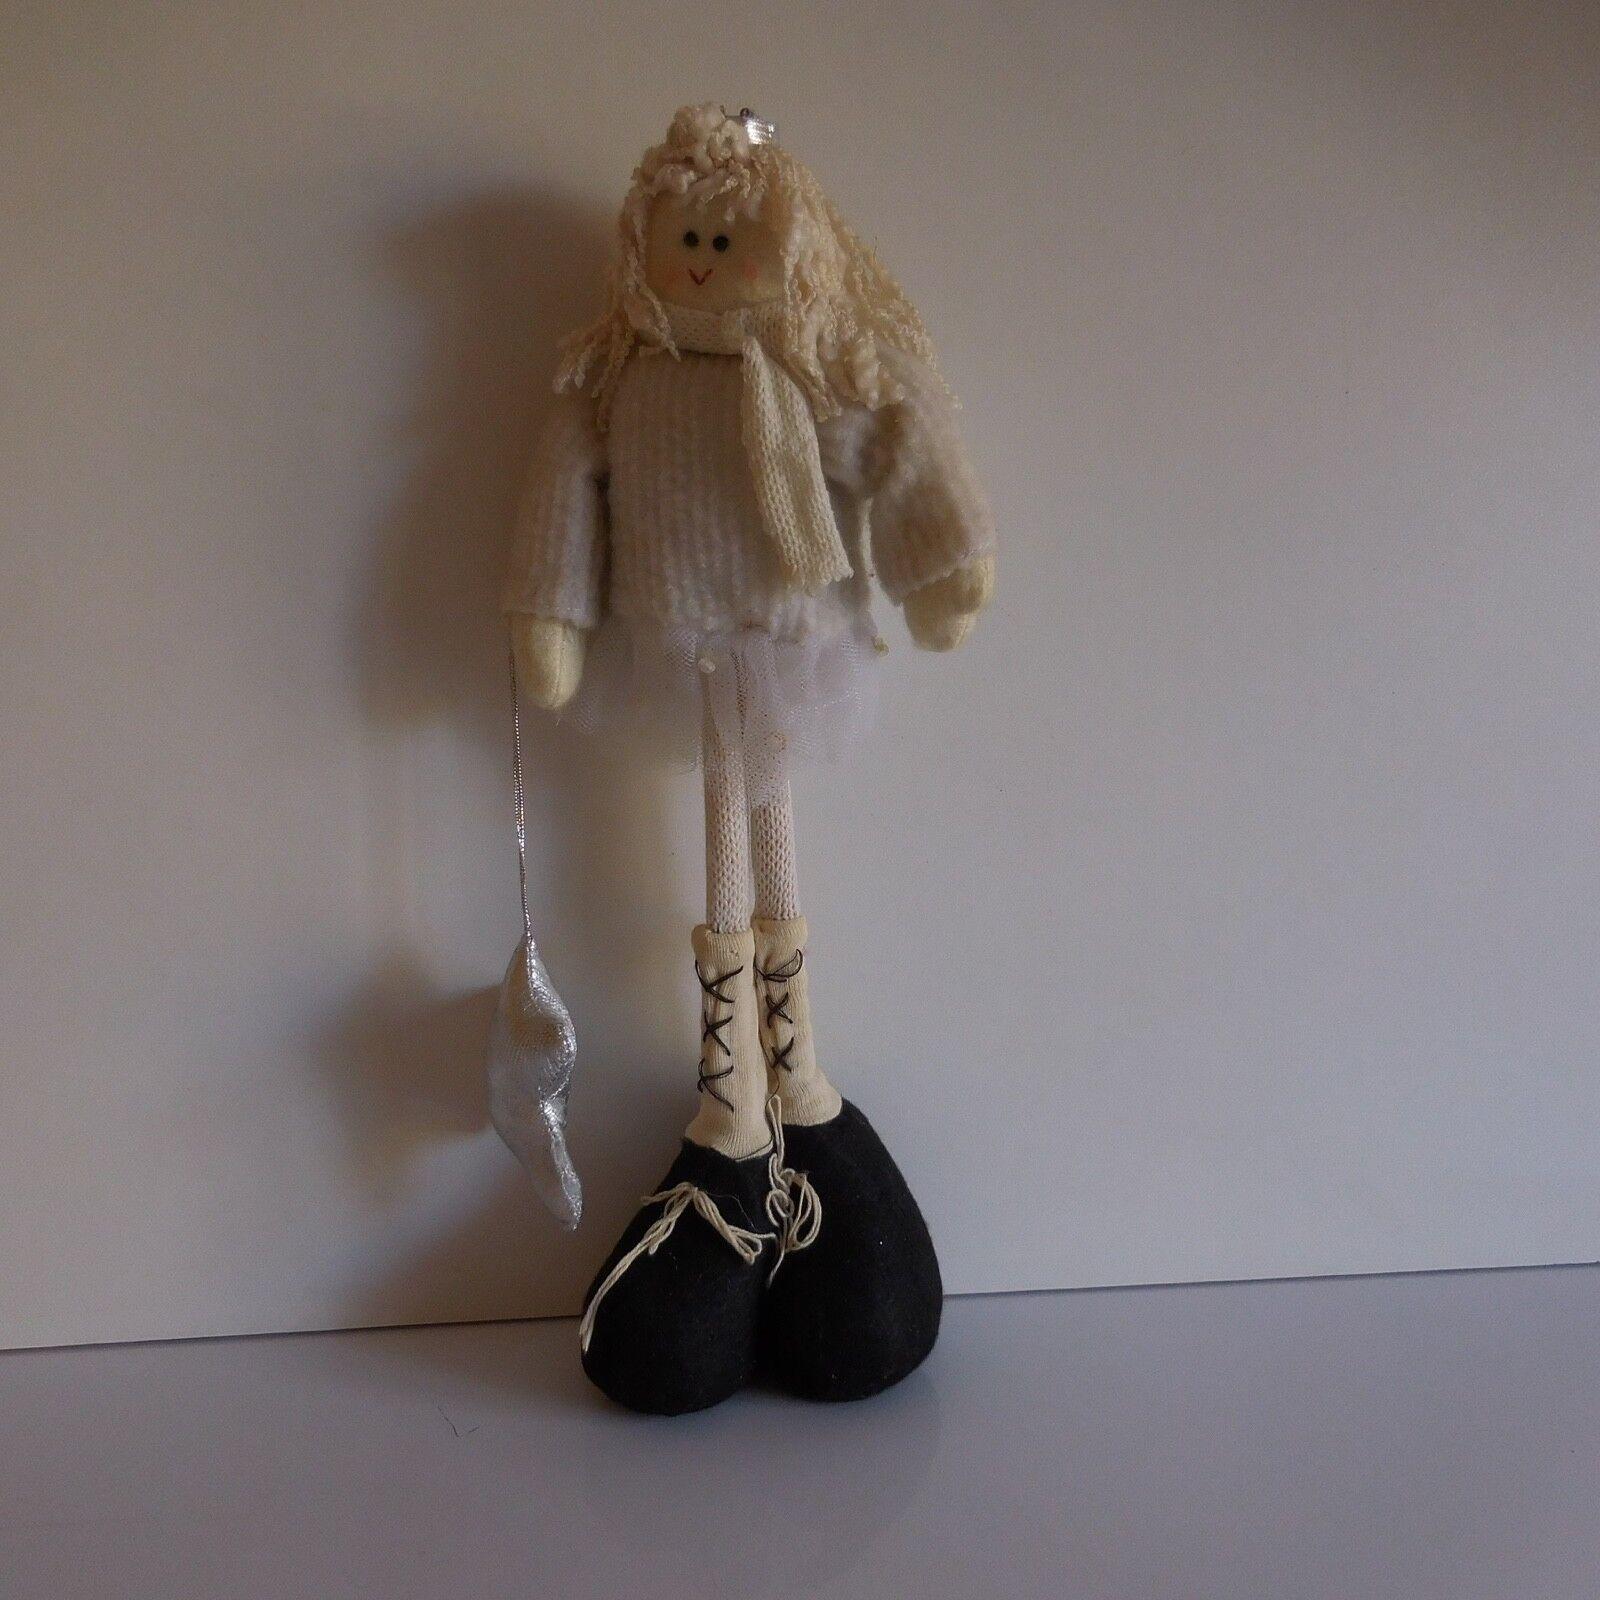 Figurine Doll Artist Cloth Handmade Fabric Art Deco Vintage Xx France N3369